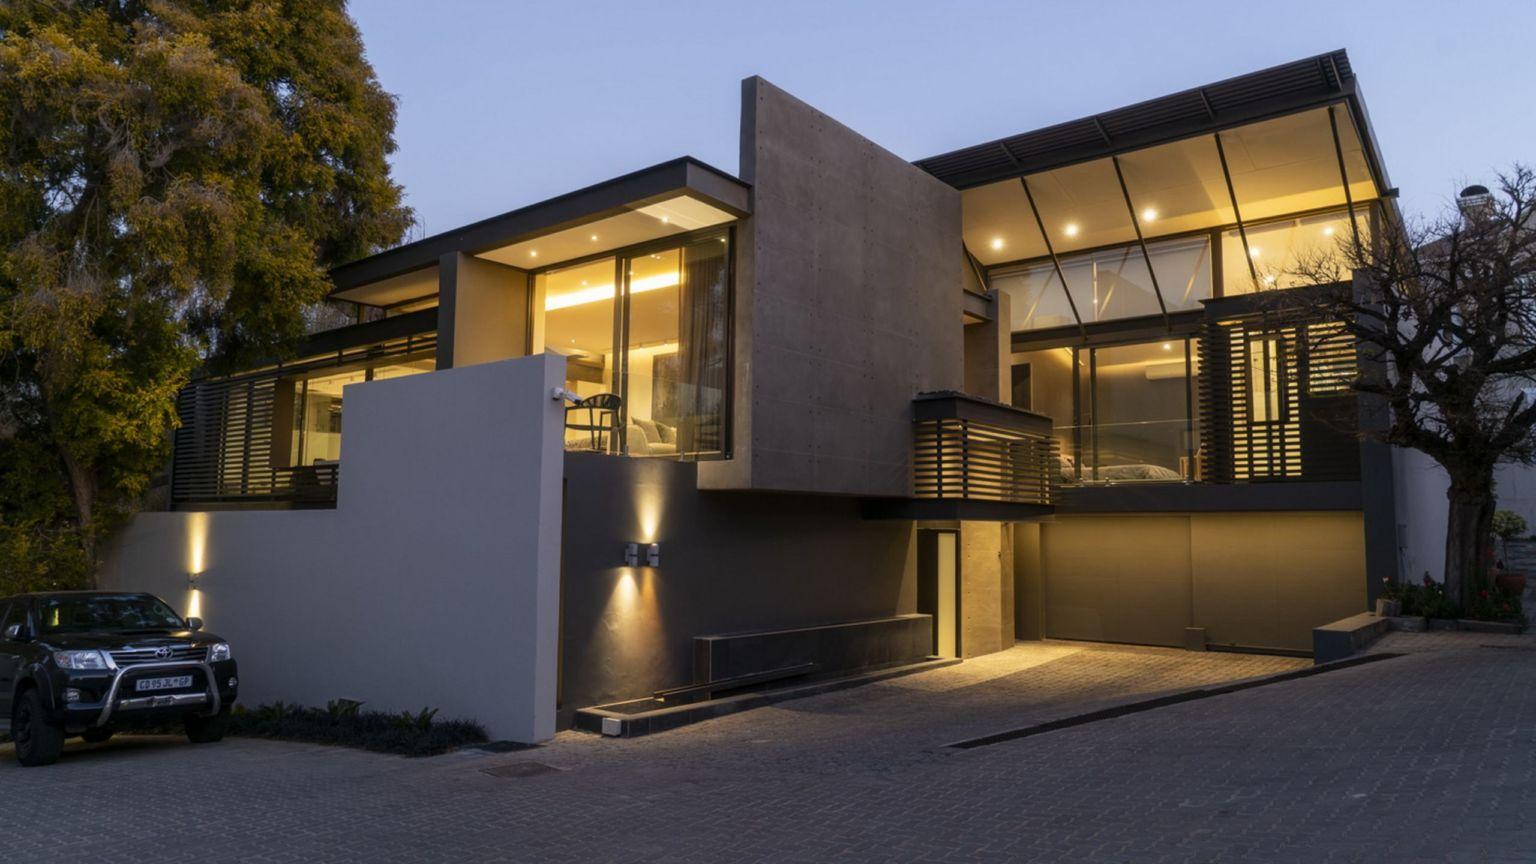 House in Sandown